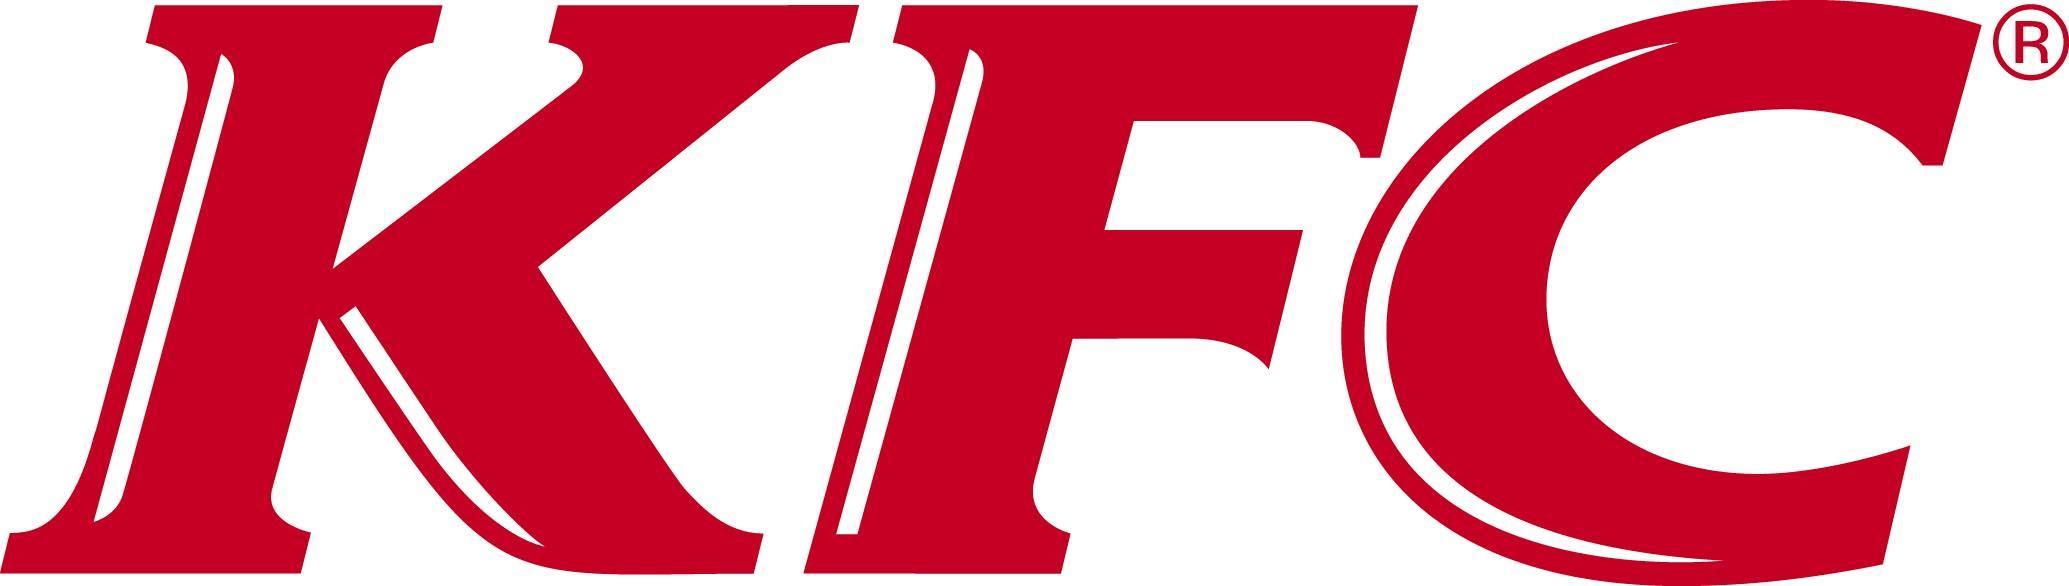 Kfc Logo History File Kfc Logo Red Copy Jpg